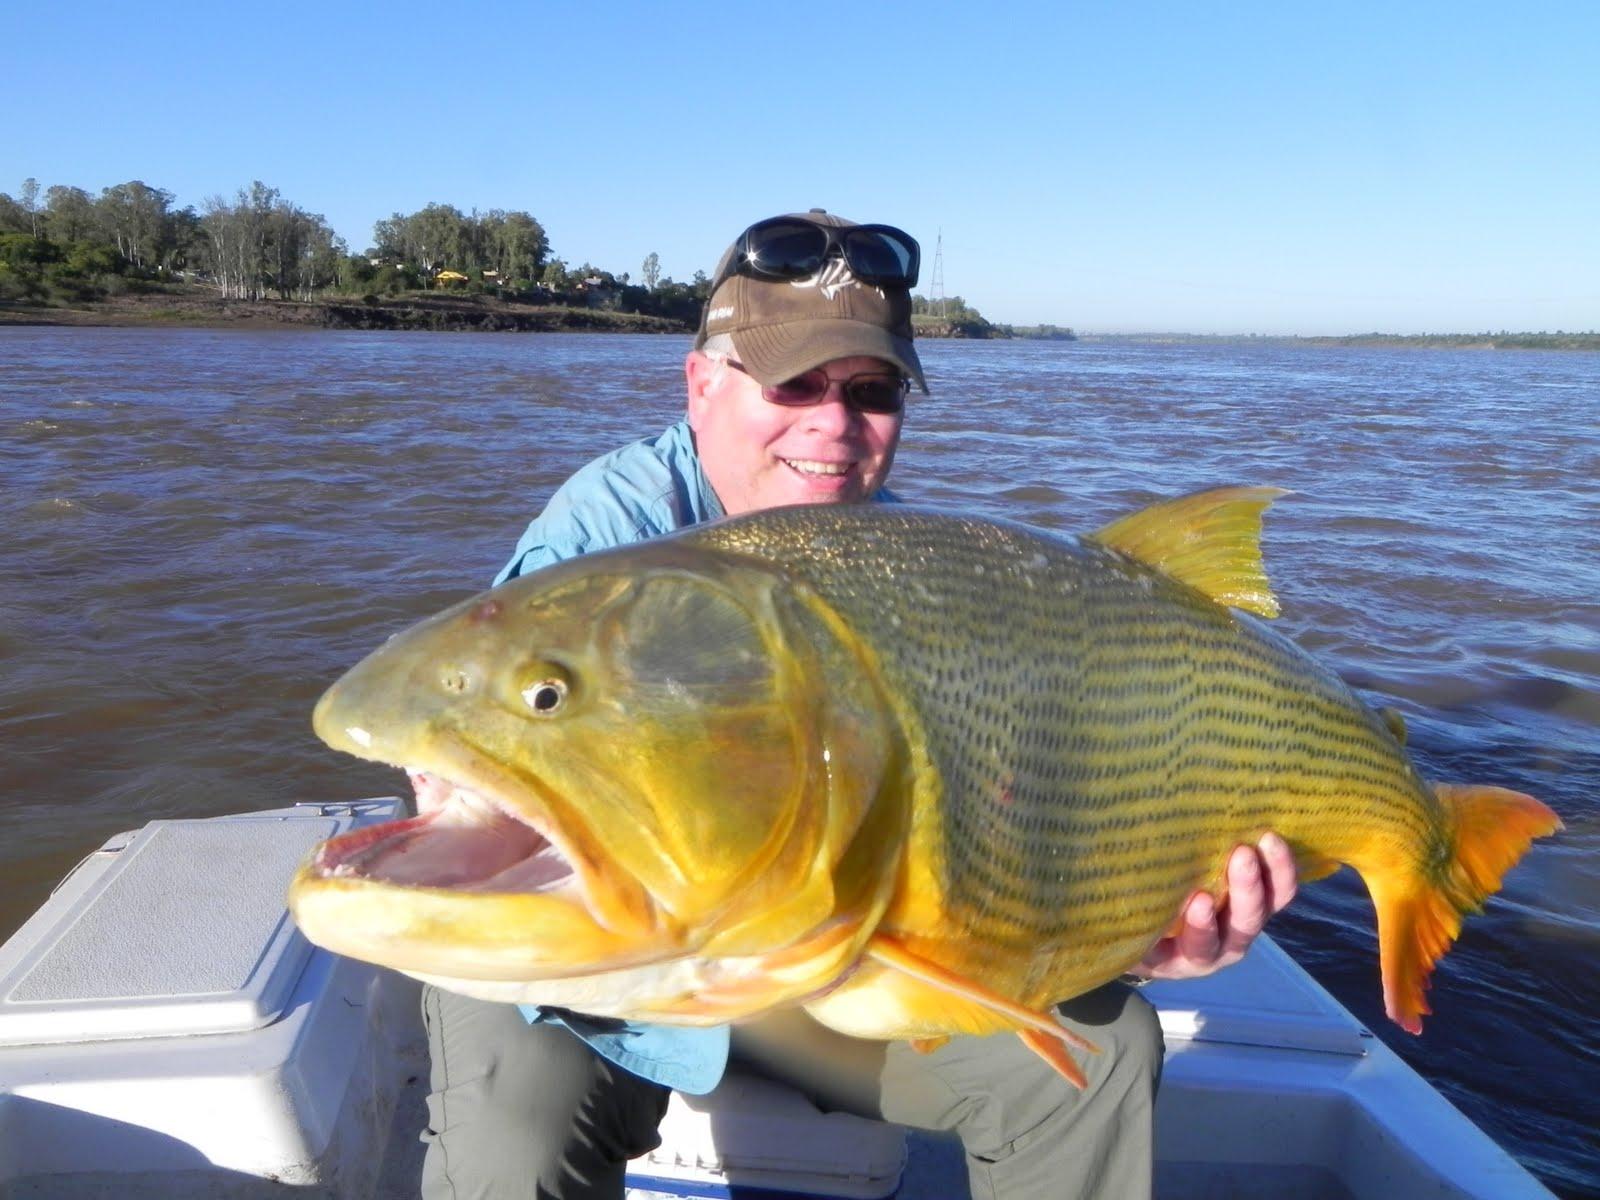 The fishing news uruguay river for monster golden dorado for Golden dorado fish